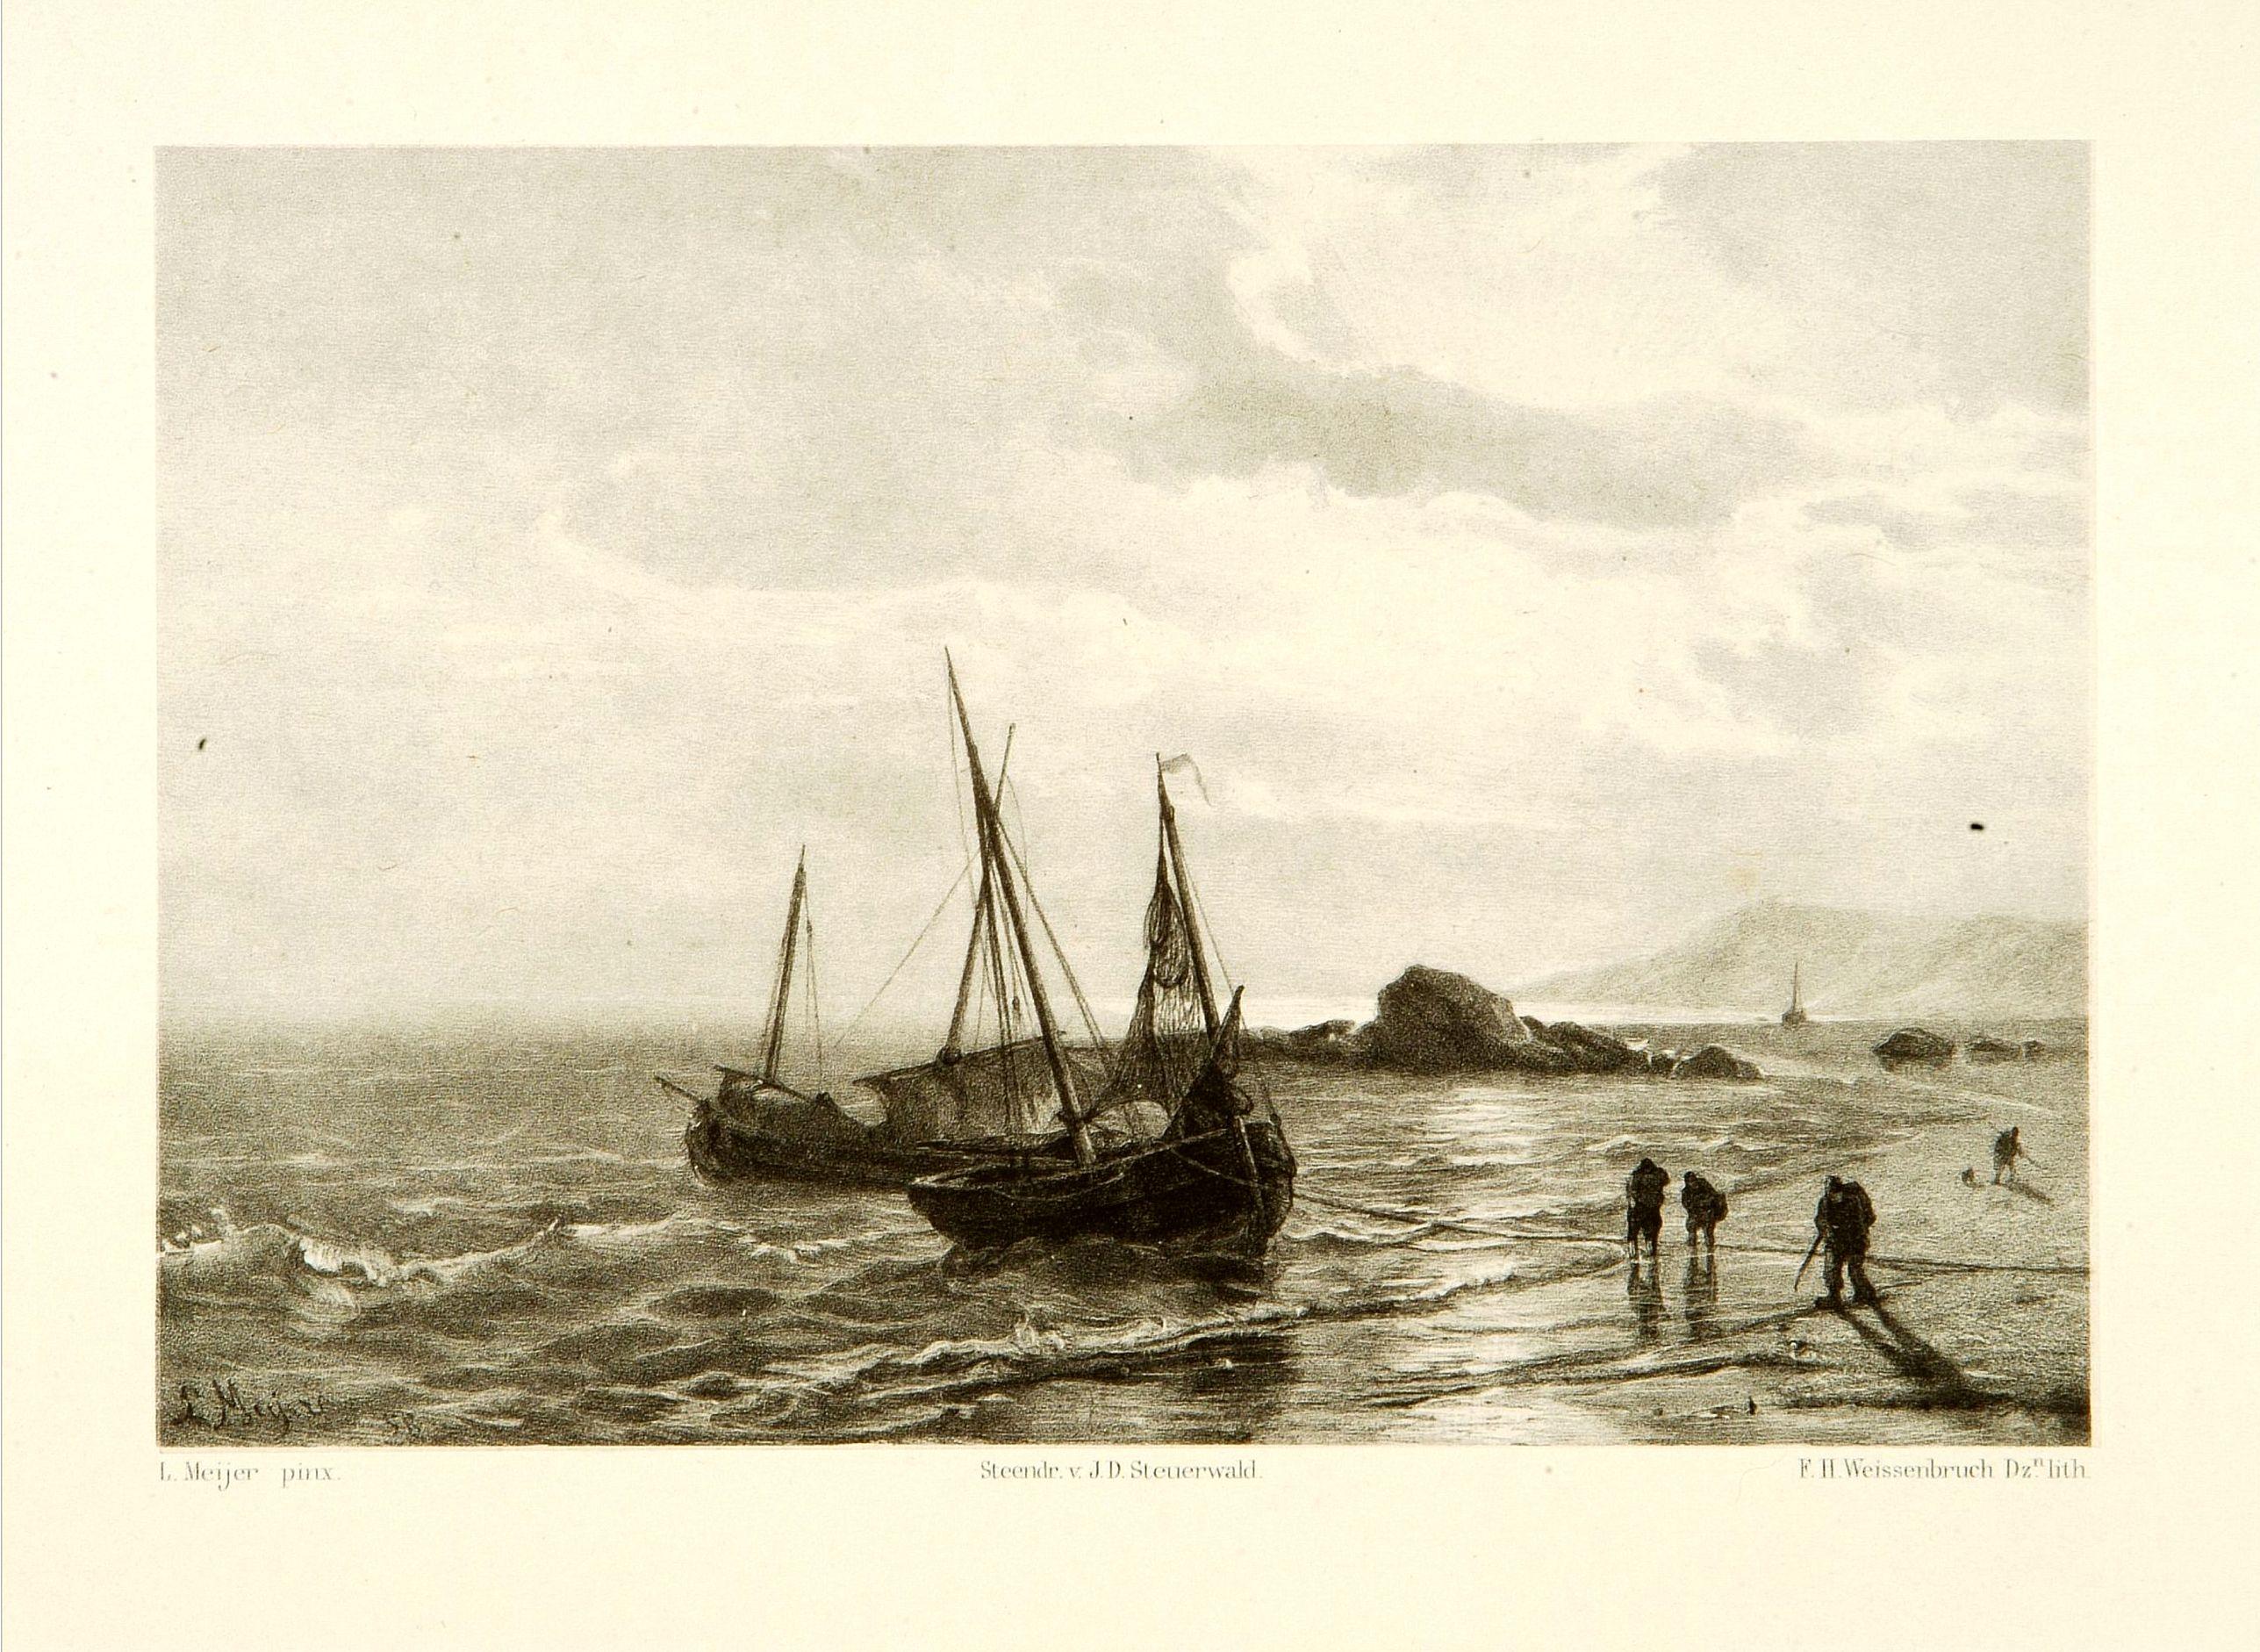 WEISSENBRUCH, F.H. -  Shipping